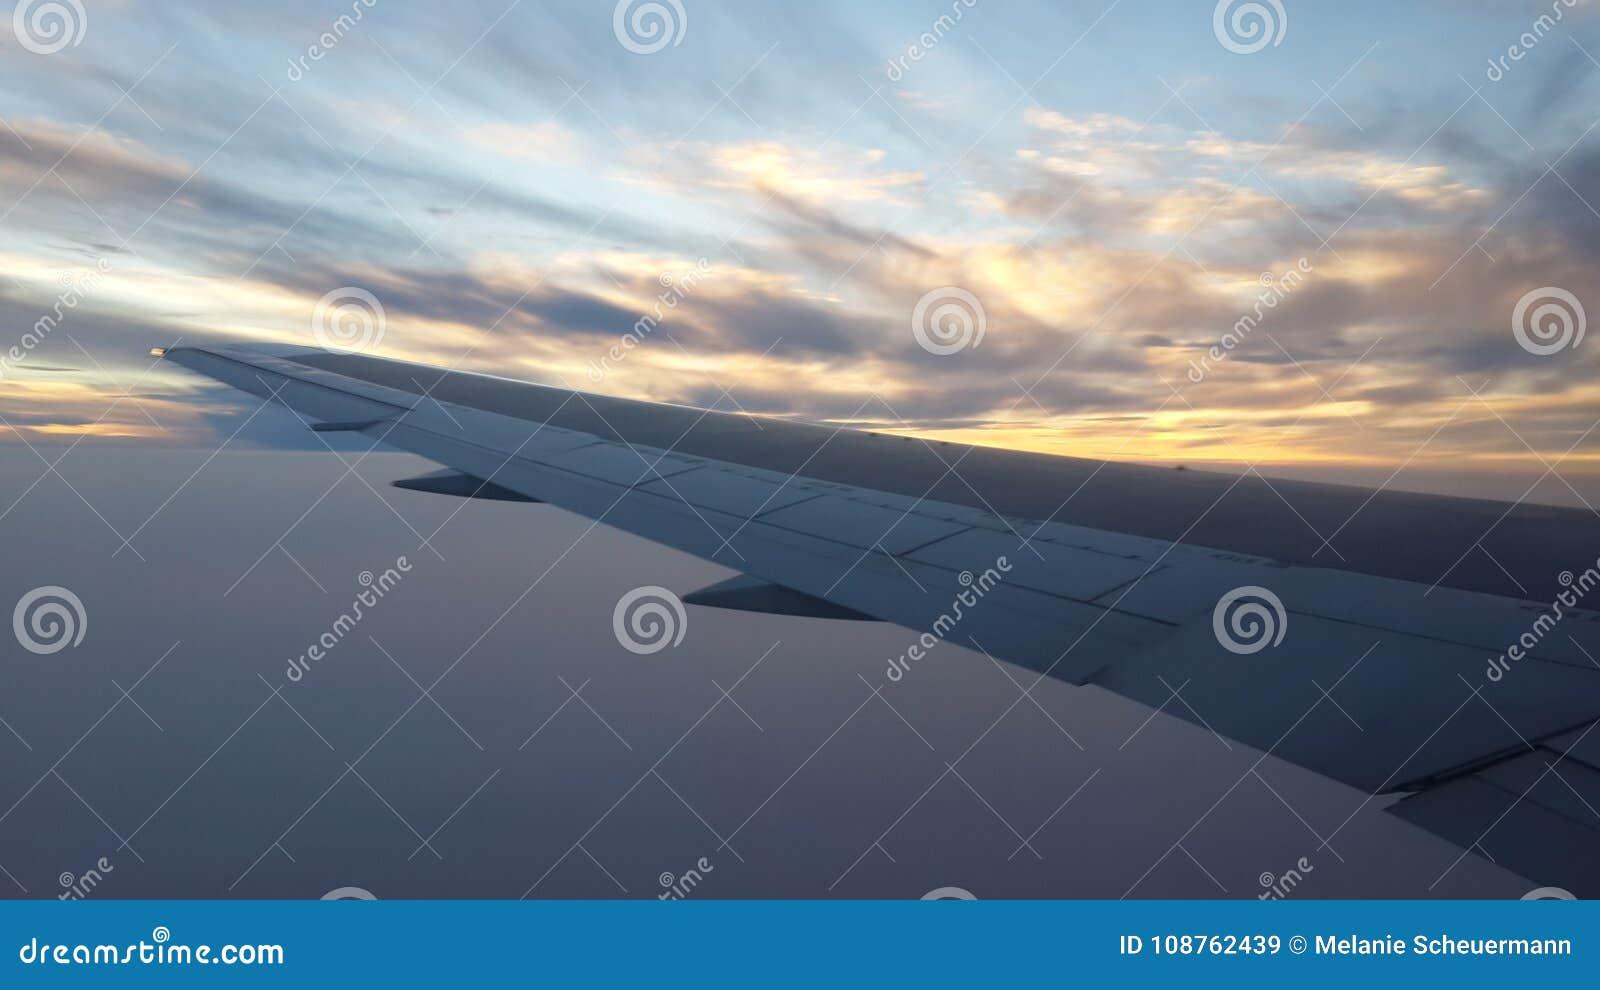 Flying sky high at dusk